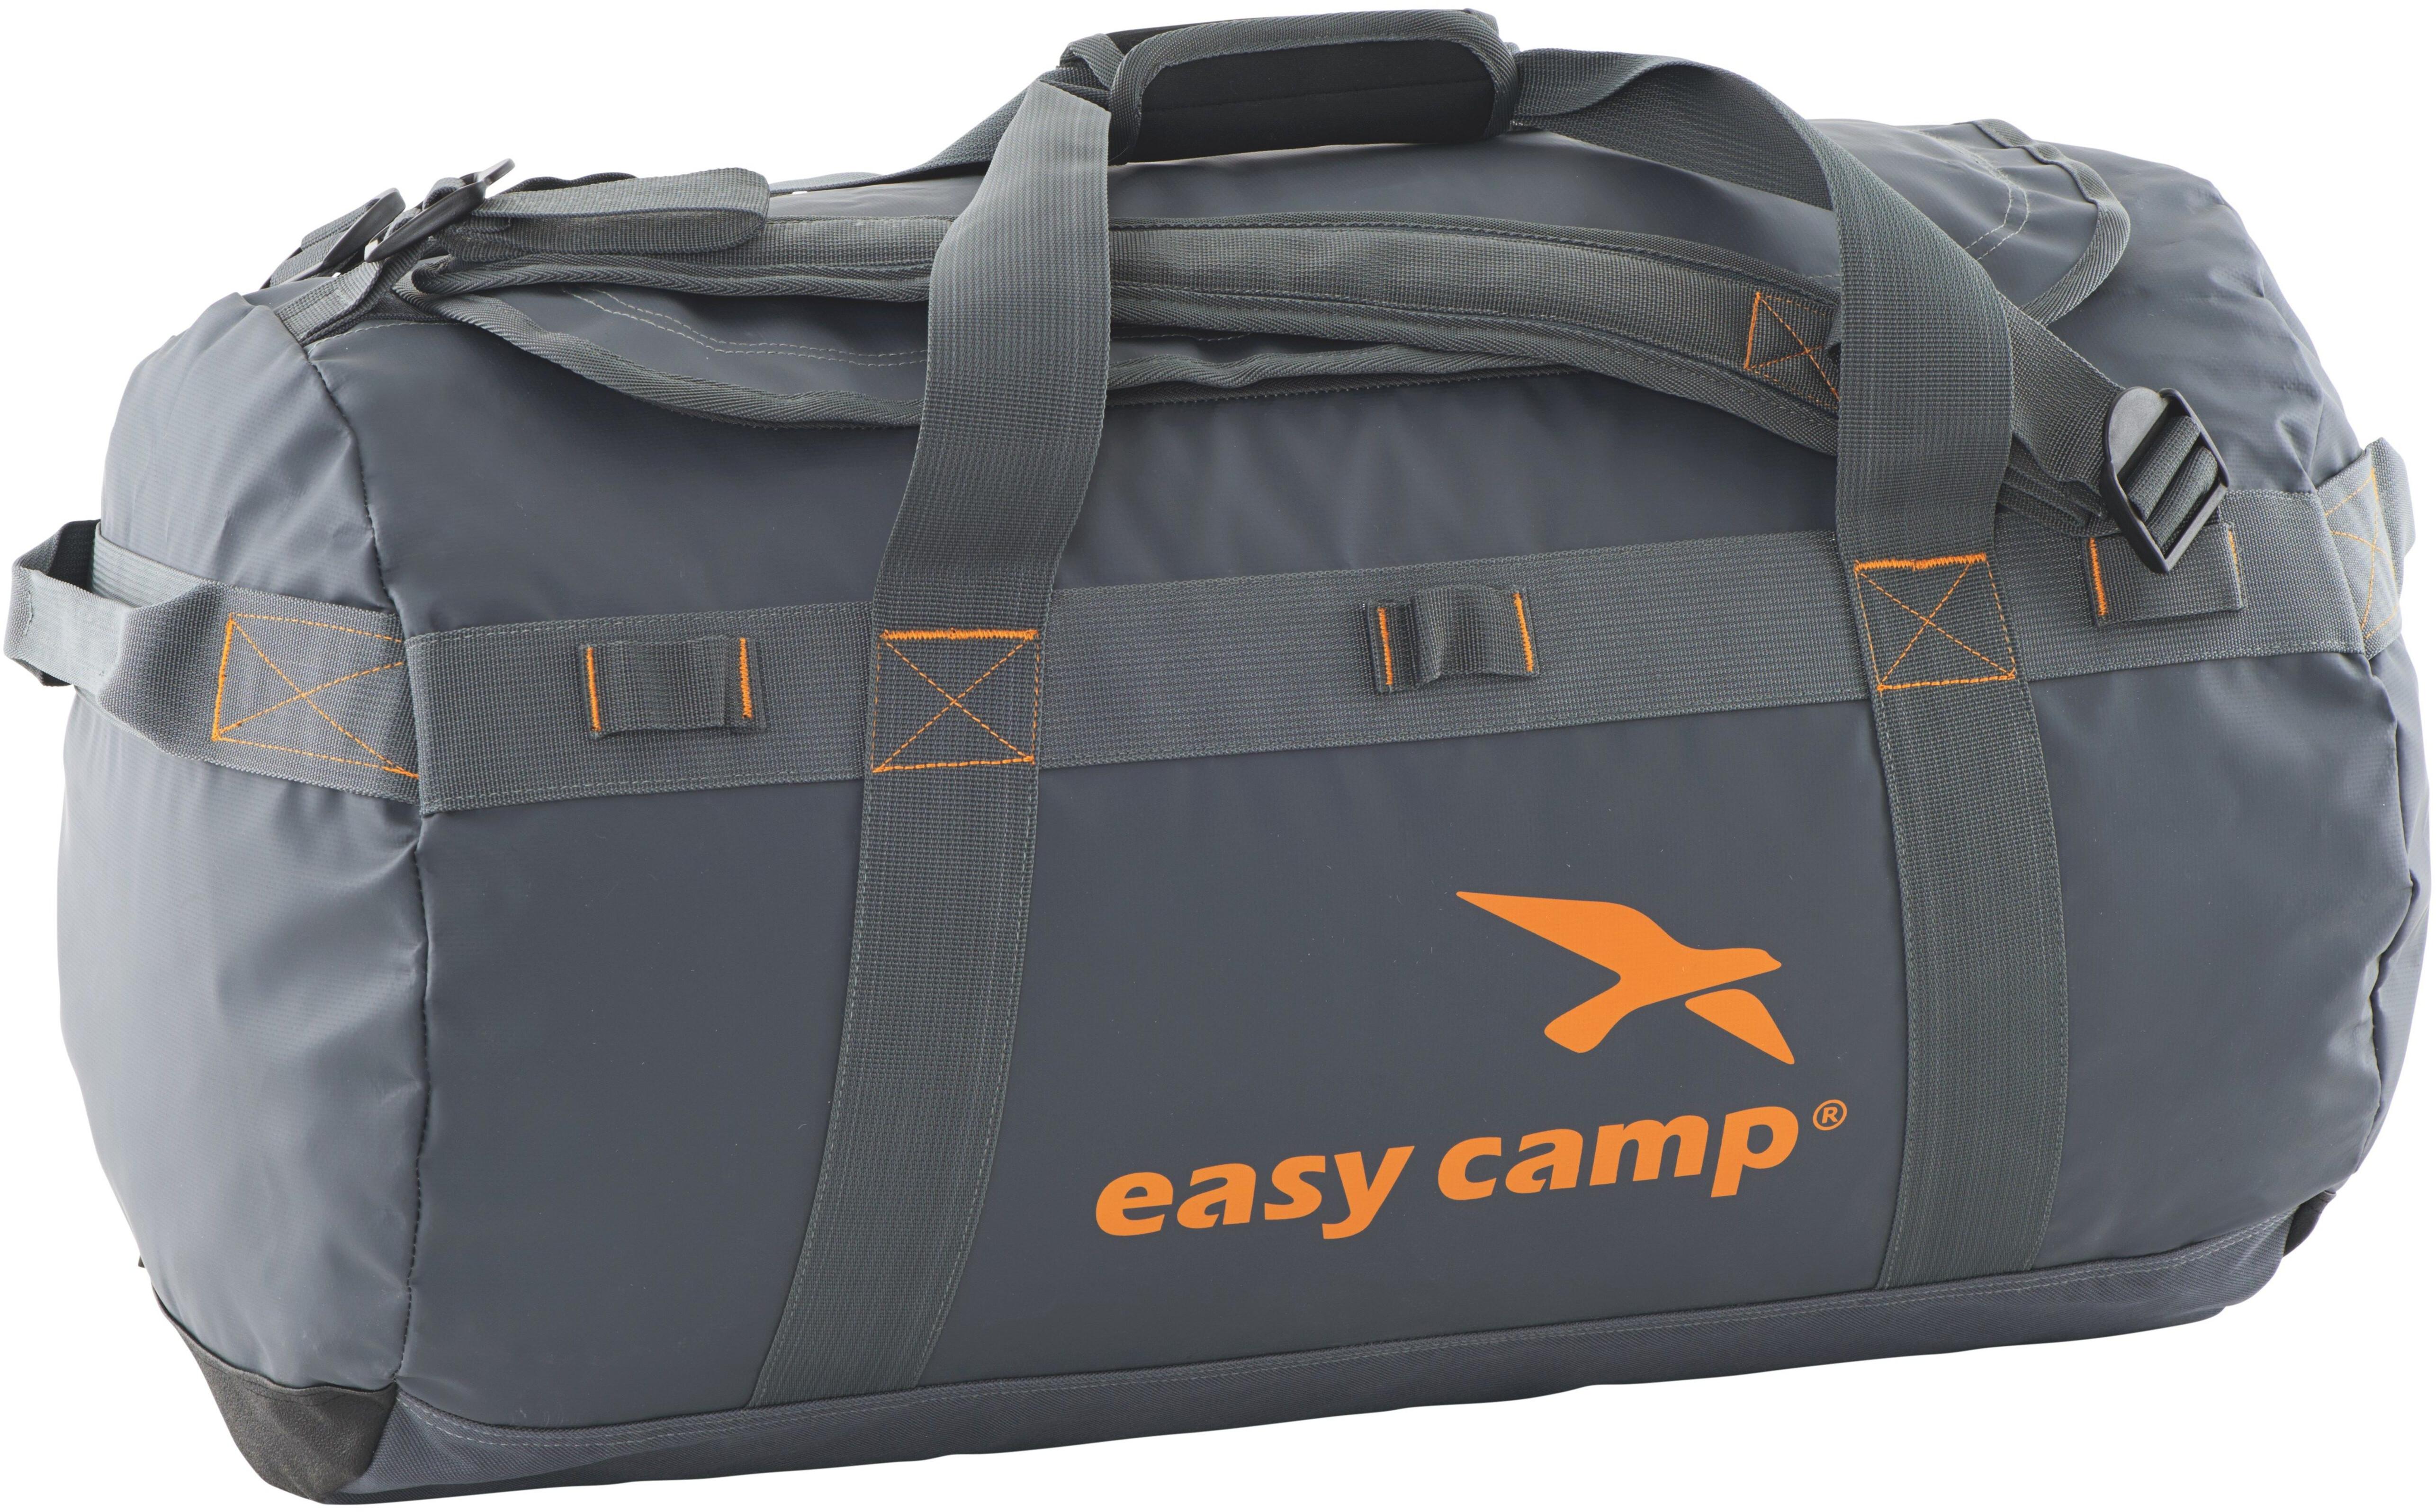 fdc94b177 Easy Camp Porter 60 Bag